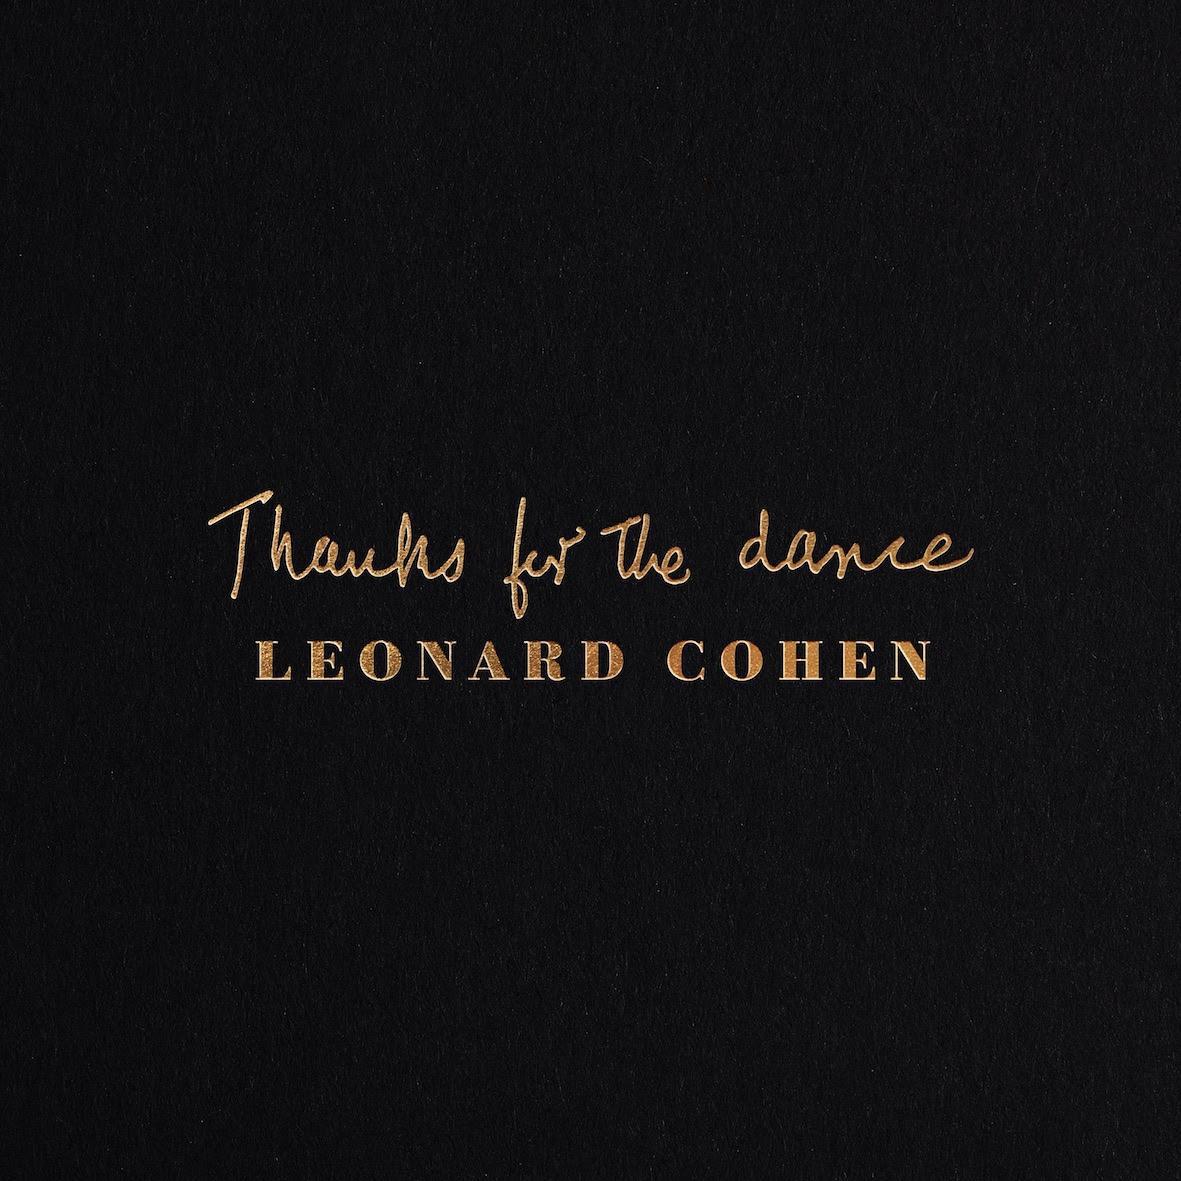 LEONARD THANKS